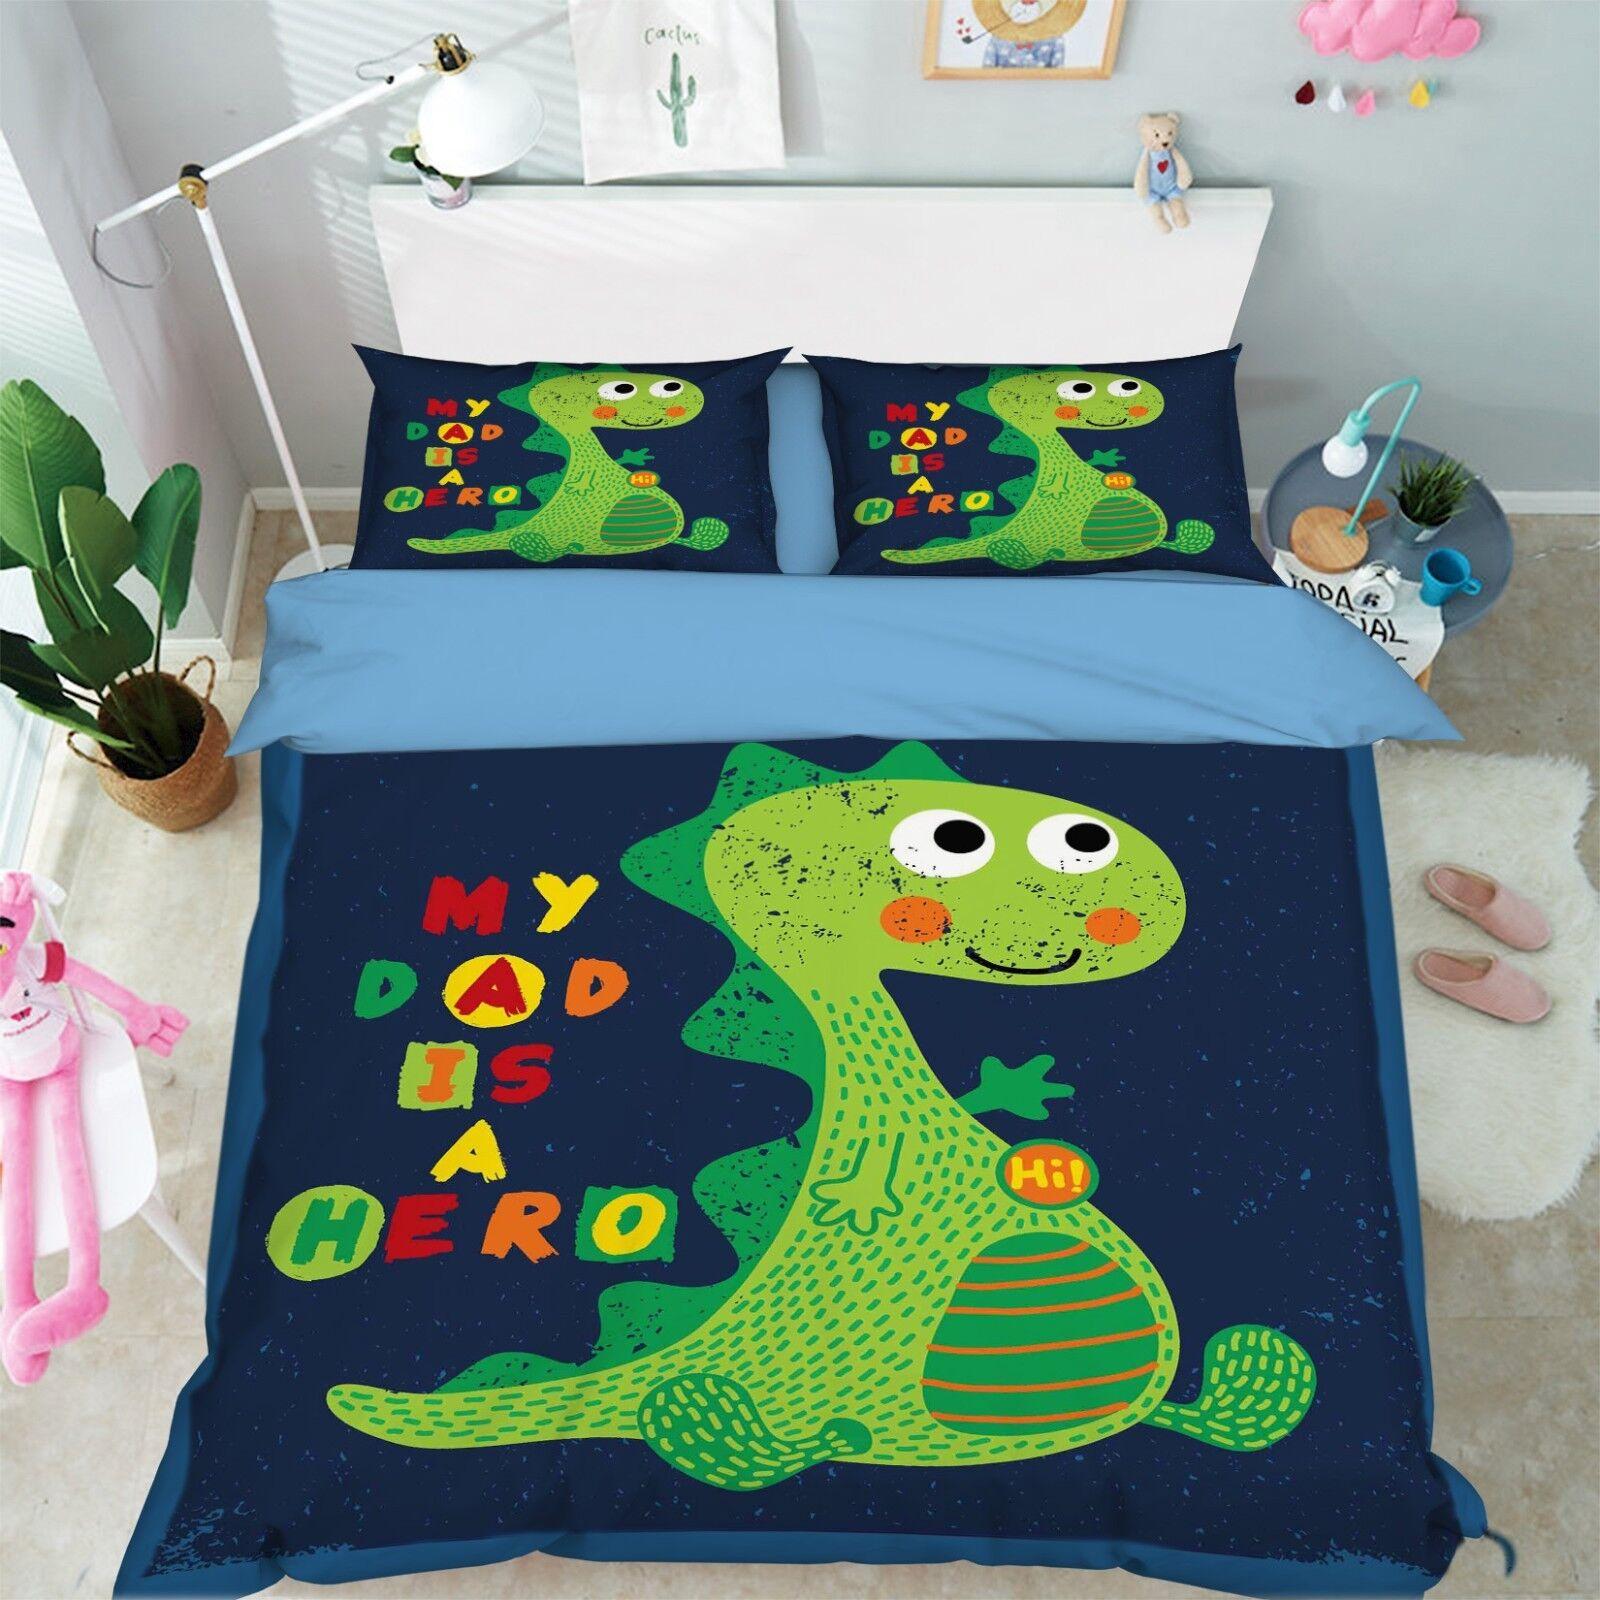 3D Cute Dinosaur Bed Pillowcases Quilt Duvet Cover Set Single Queen King Größe AU